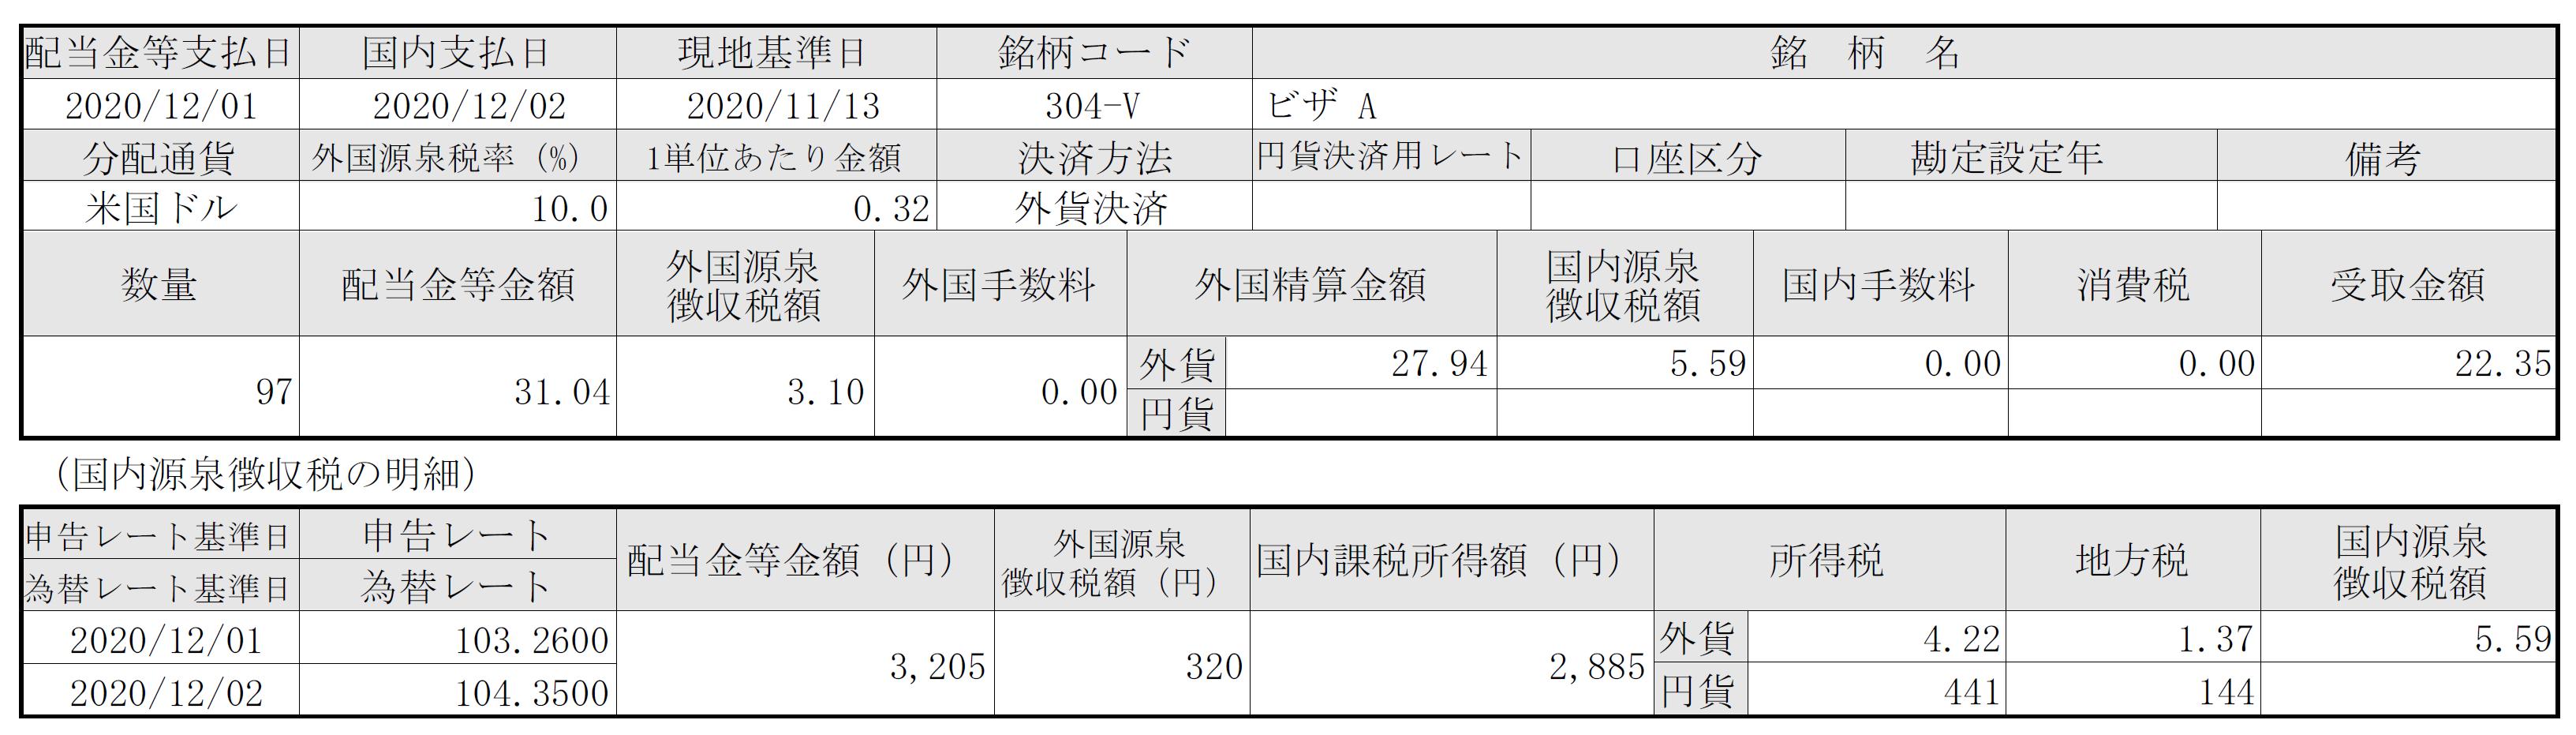 f:id:hodo-work:20201215135417p:plain